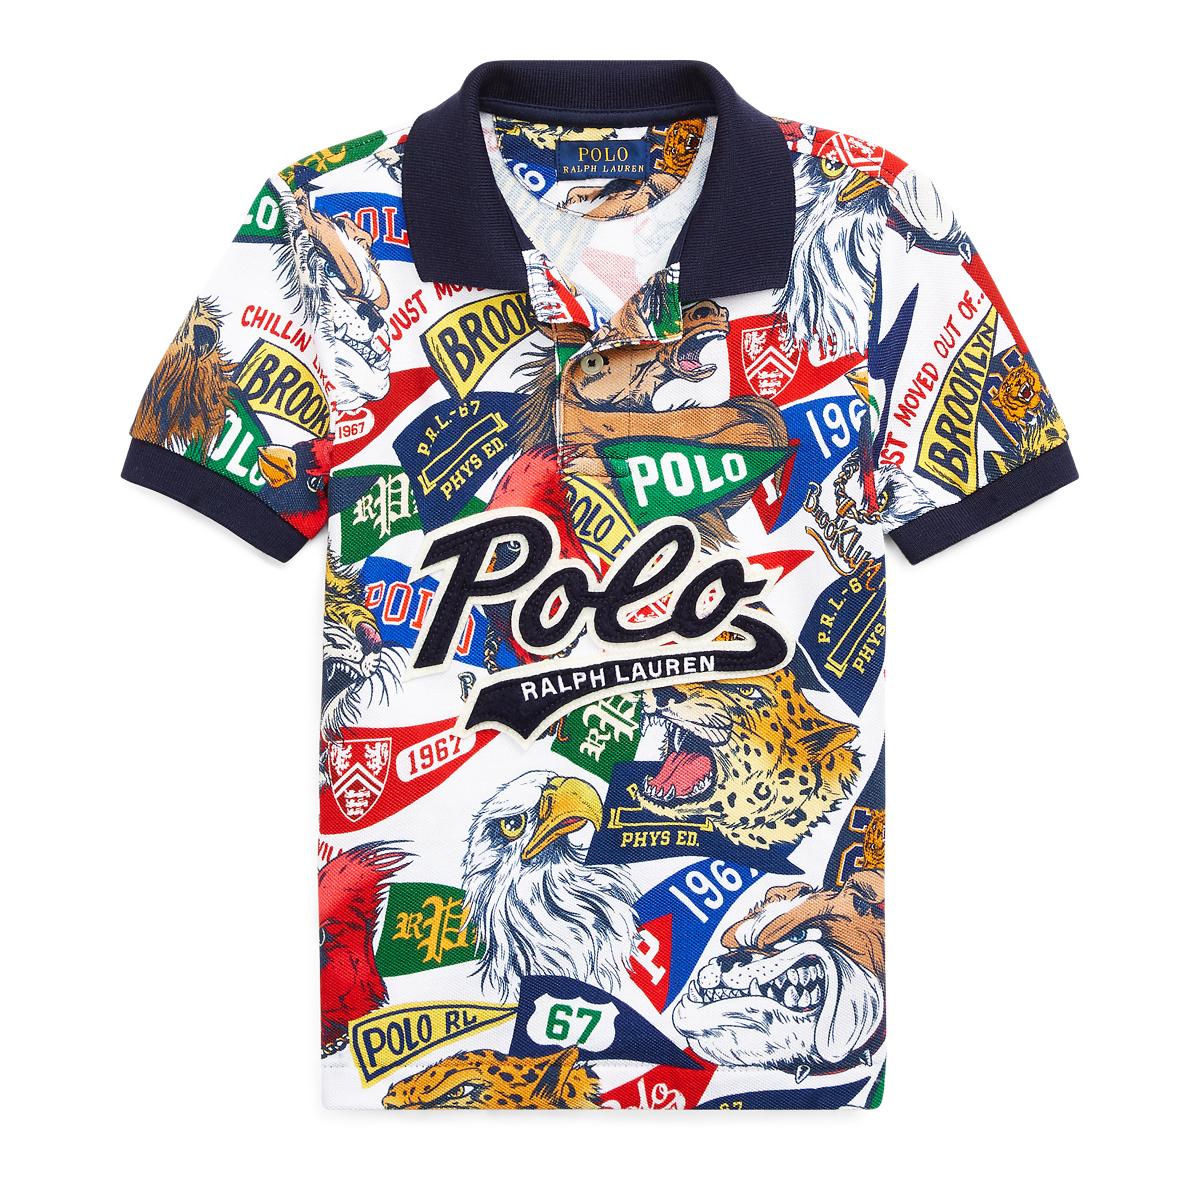 088ff59ba Cotton Mesh Graphic Polo Shirt